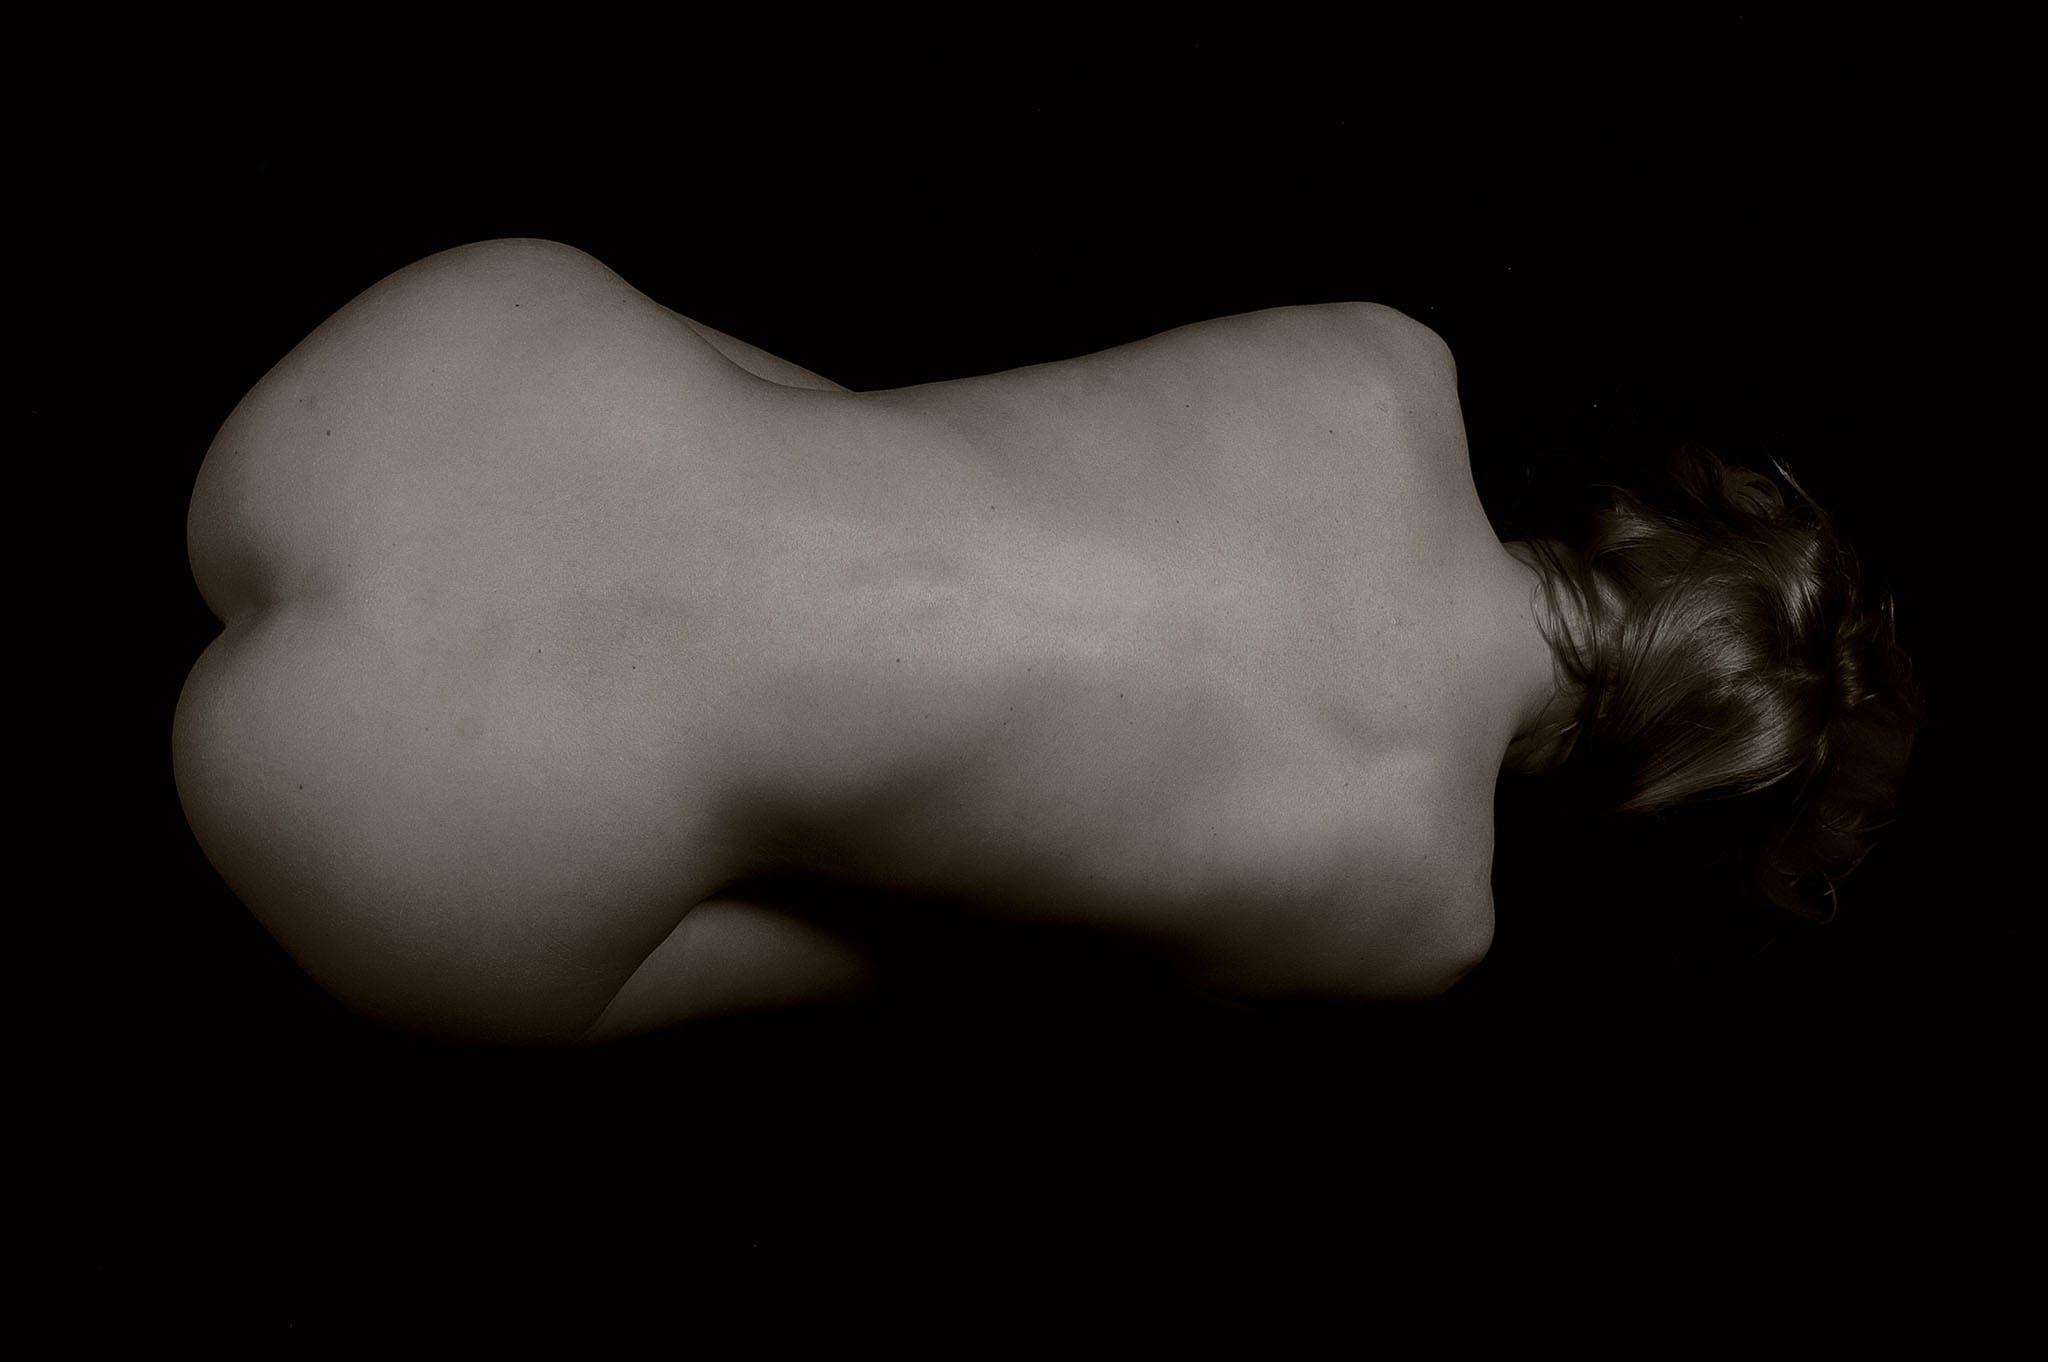 Akt 16 - Akt Nude Act Aktfotografie Erotik Erotic